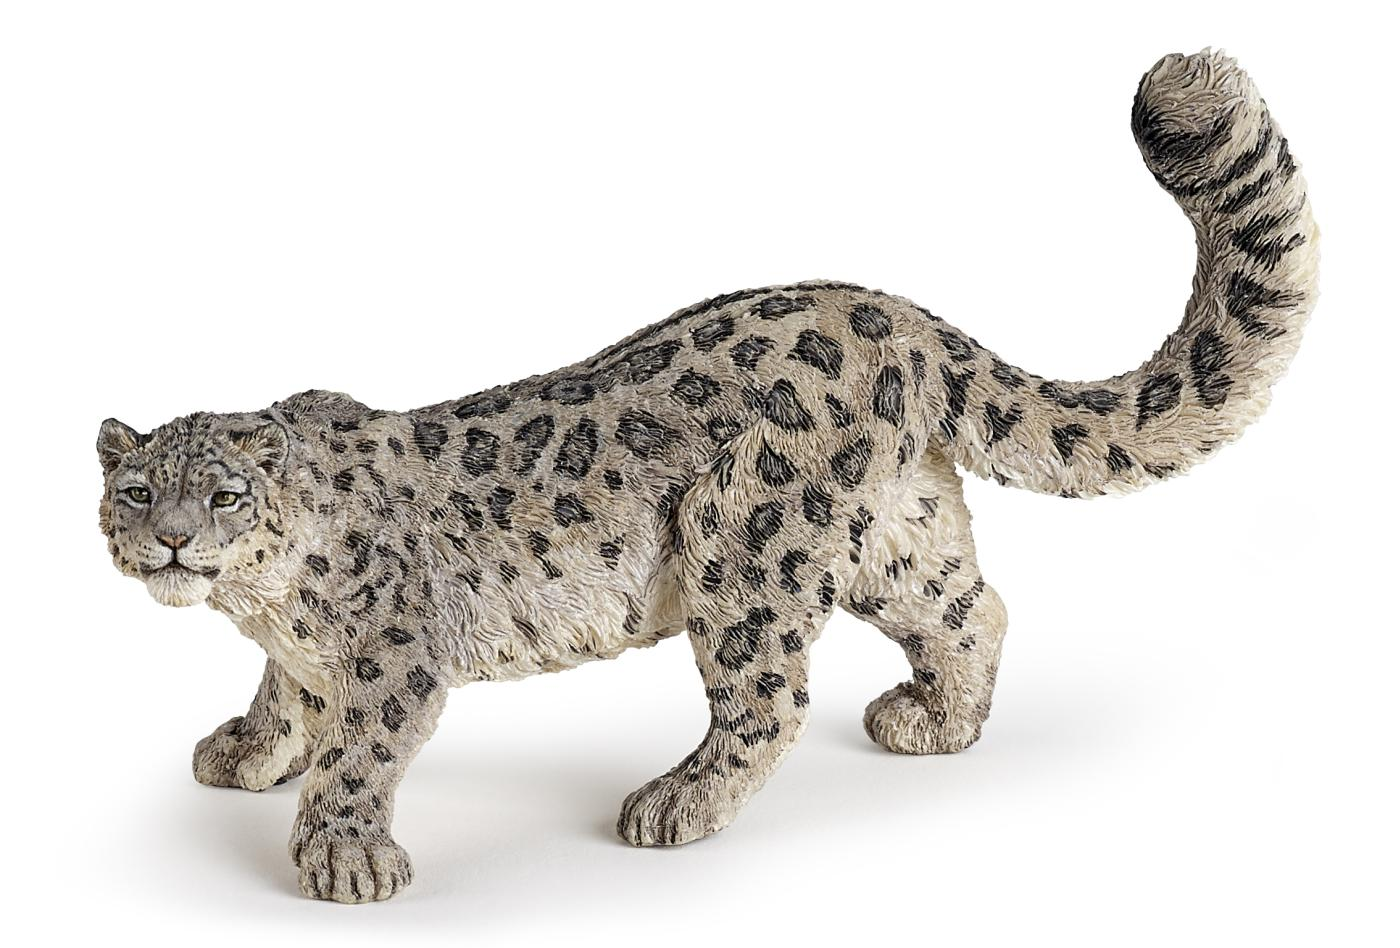 Фигурка  Снежный леопард - Фигурки животных, артикул: 165043